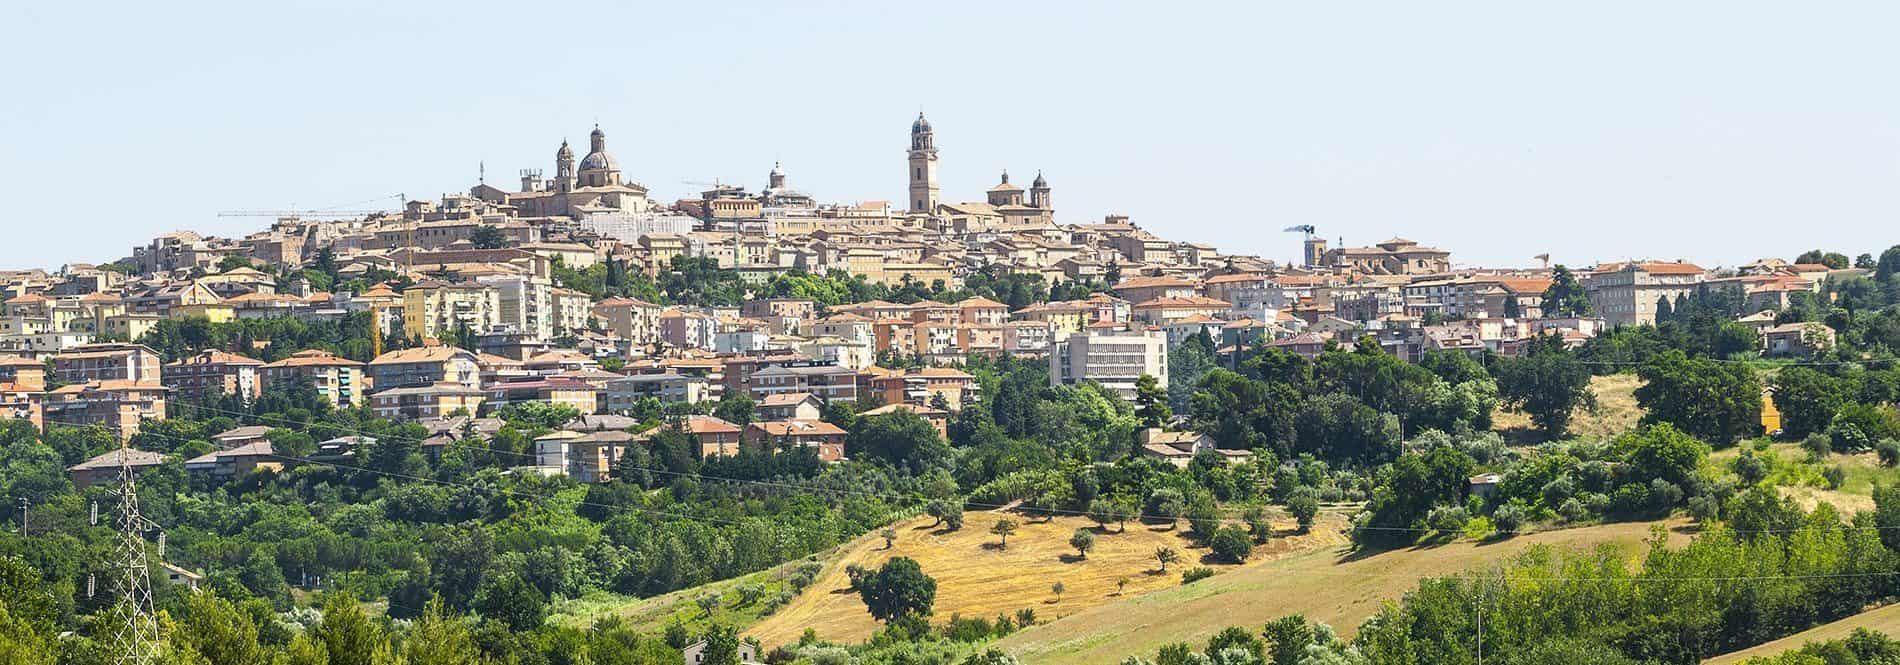 Macerata - © Vaghis - viaggi & turismo Italia - Tutti i diritti riservati